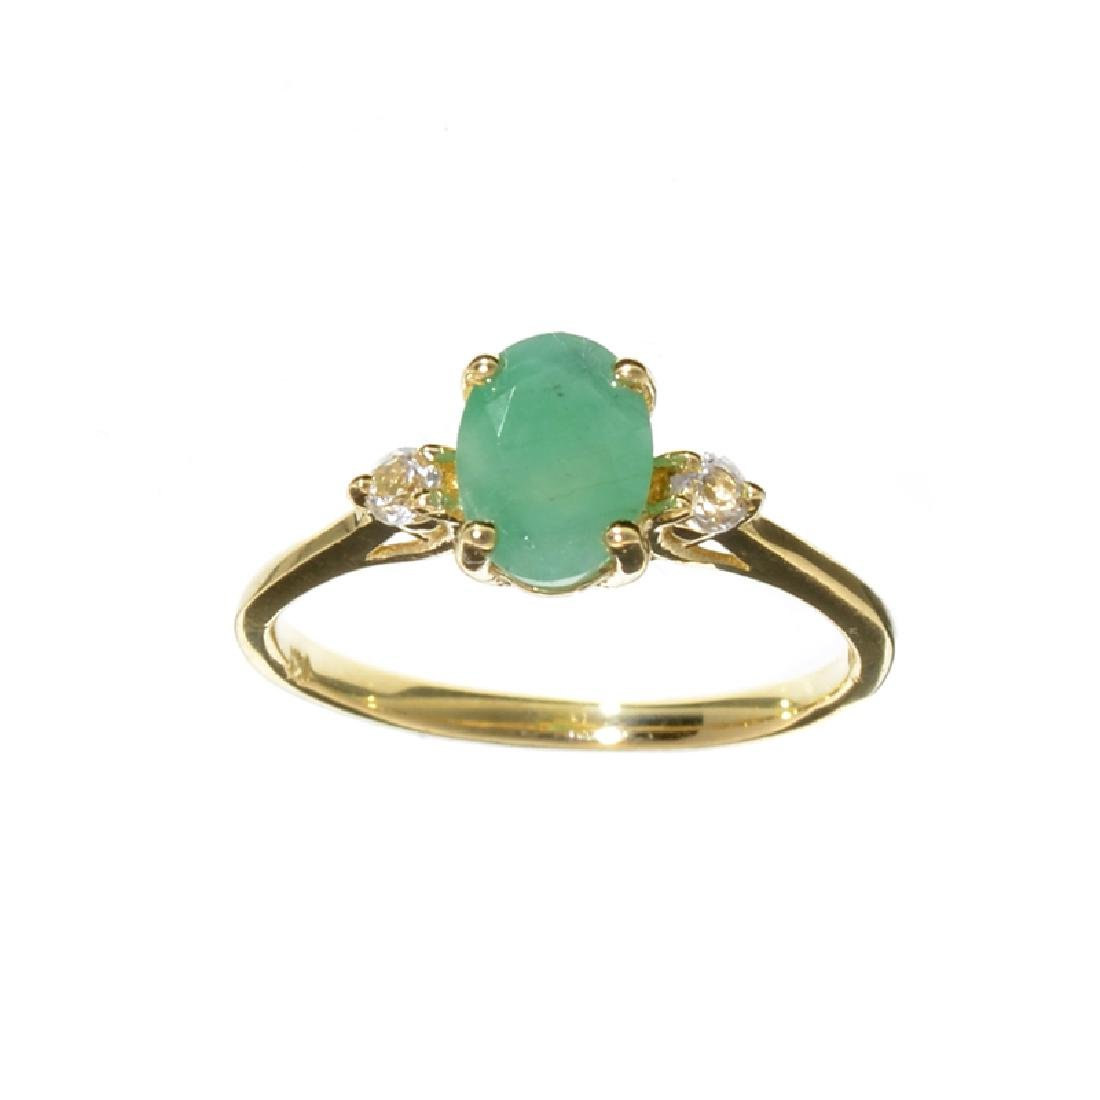 APP: 1k Fine Jewelry 14KT Gold, 1.27CT Green Emerald